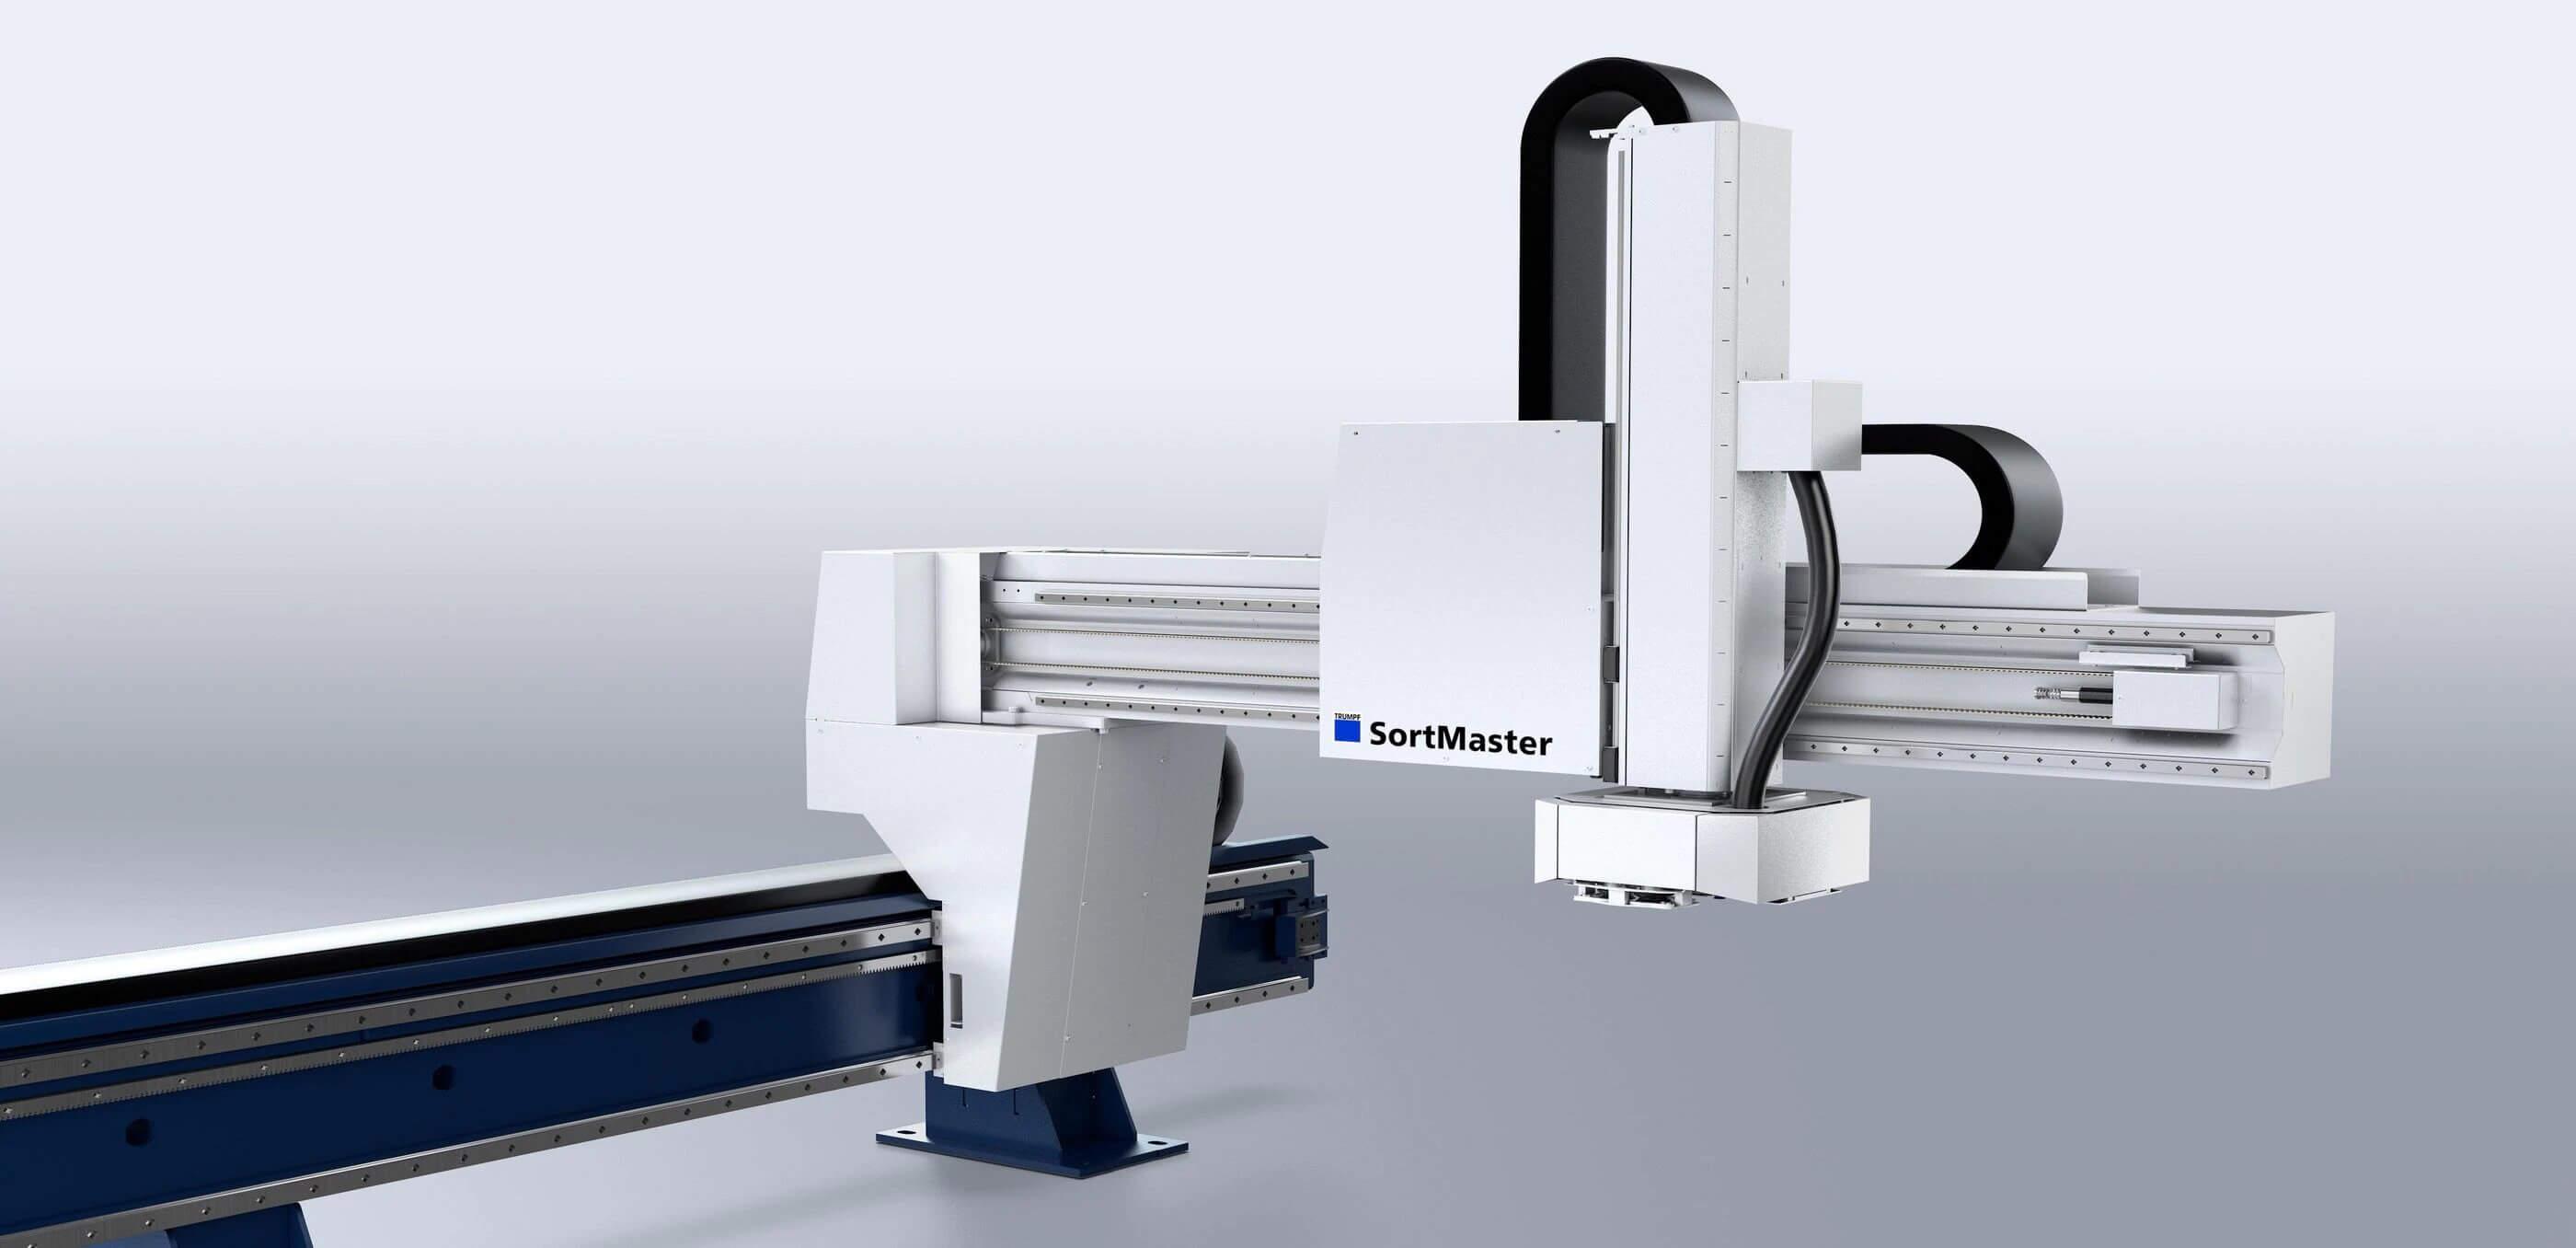 SortMaster